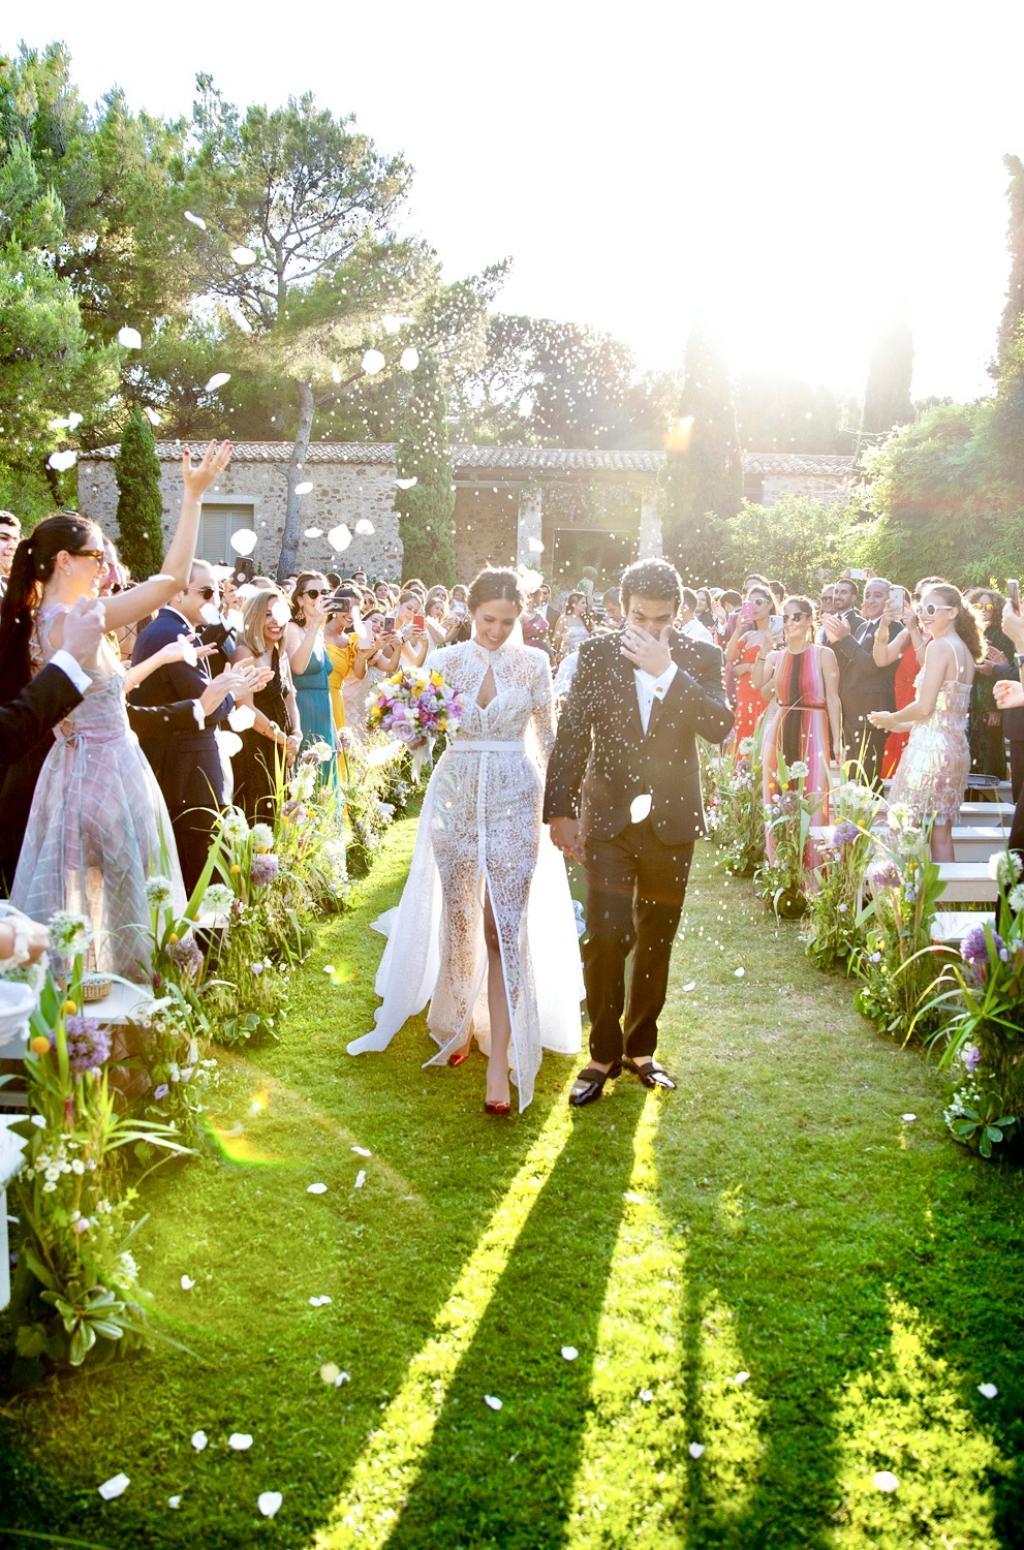 K&K Athenian Riviera pre-wedding & Sinterina wedding - Image 1